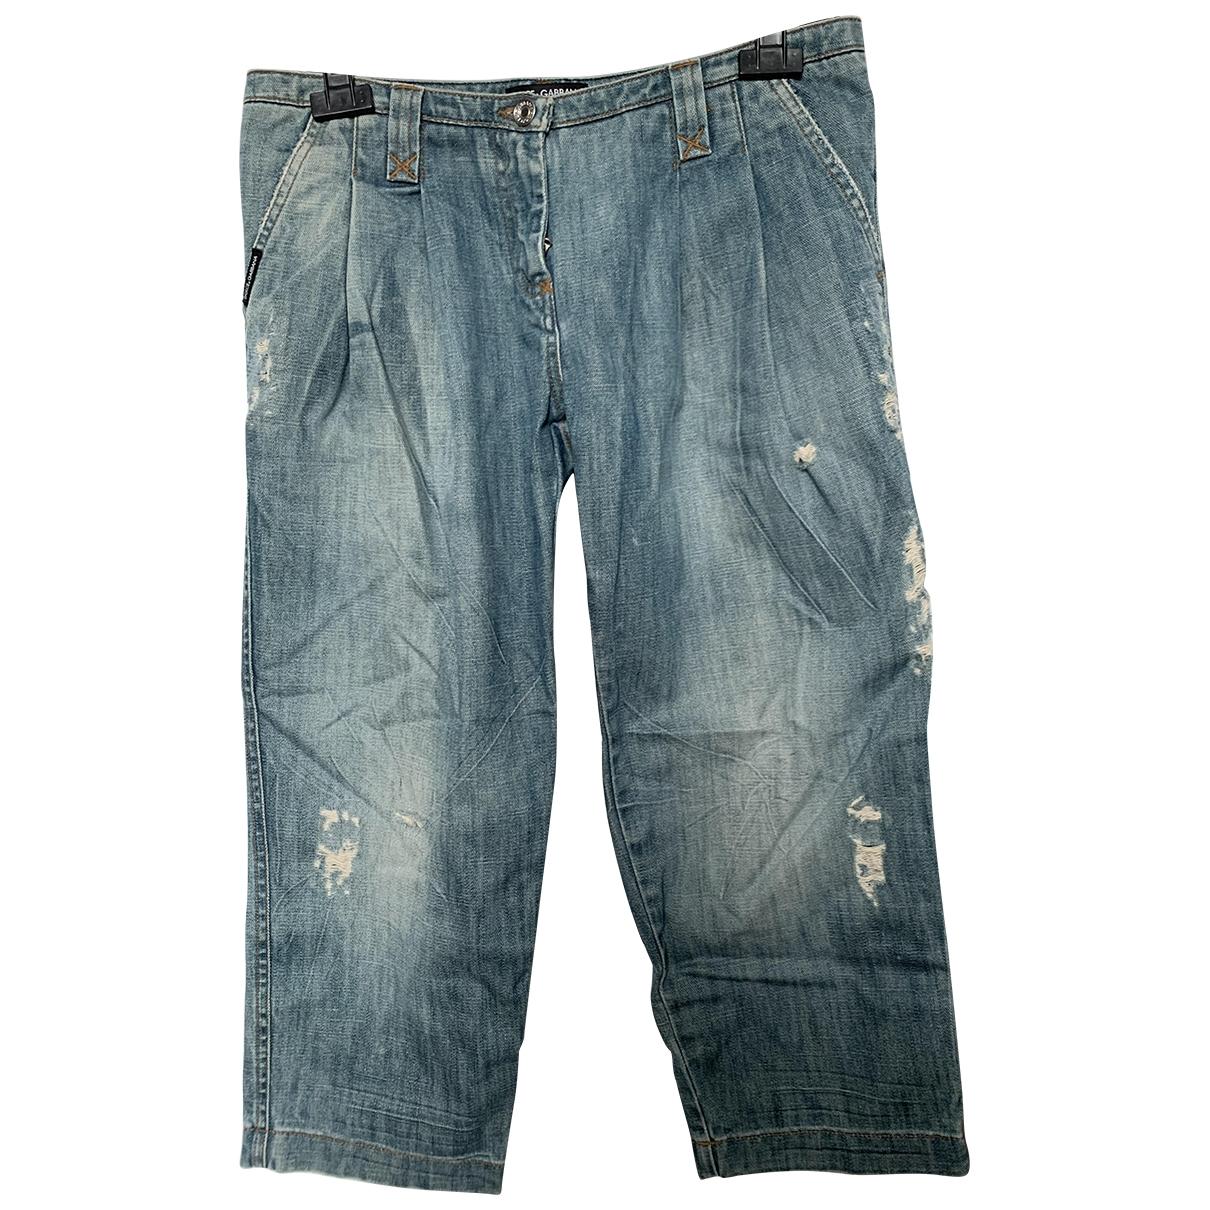 Dolce & Gabbana \N Blue Denim - Jeans Jeans for Women 42 FR